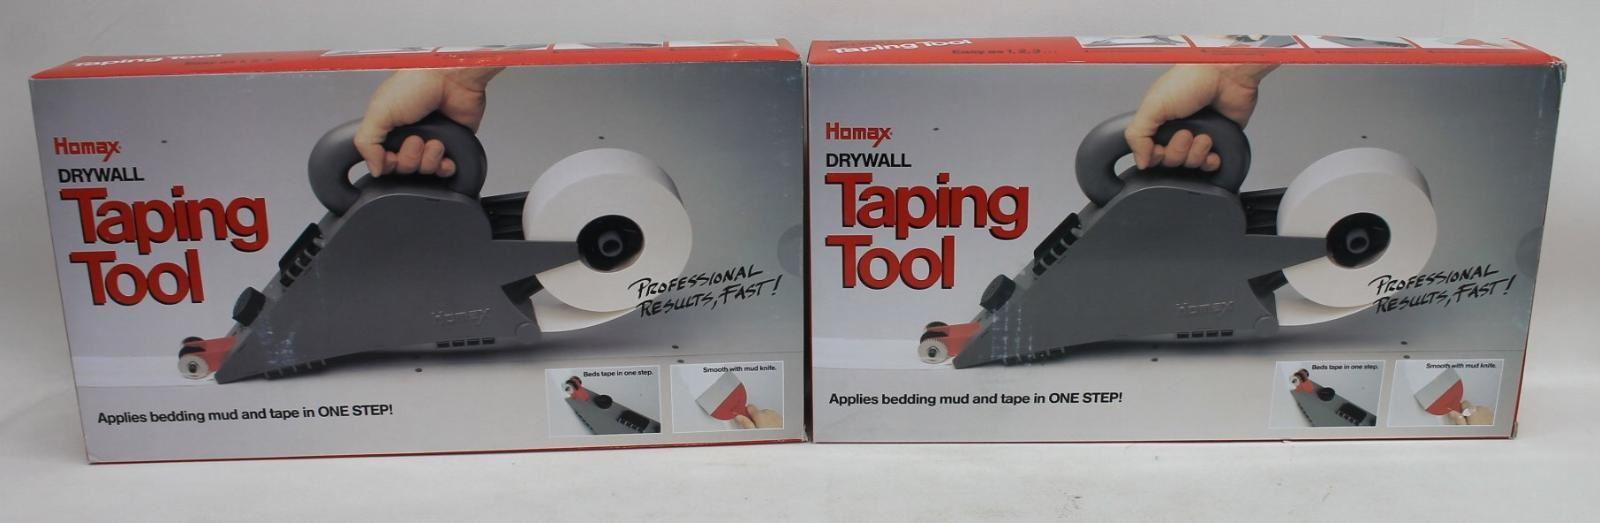 HOMAX-6500-Drywall-Banjo-Sheetrock-Tape-amp-Mud-Applicator-Taping-Tool-2x-BNIB